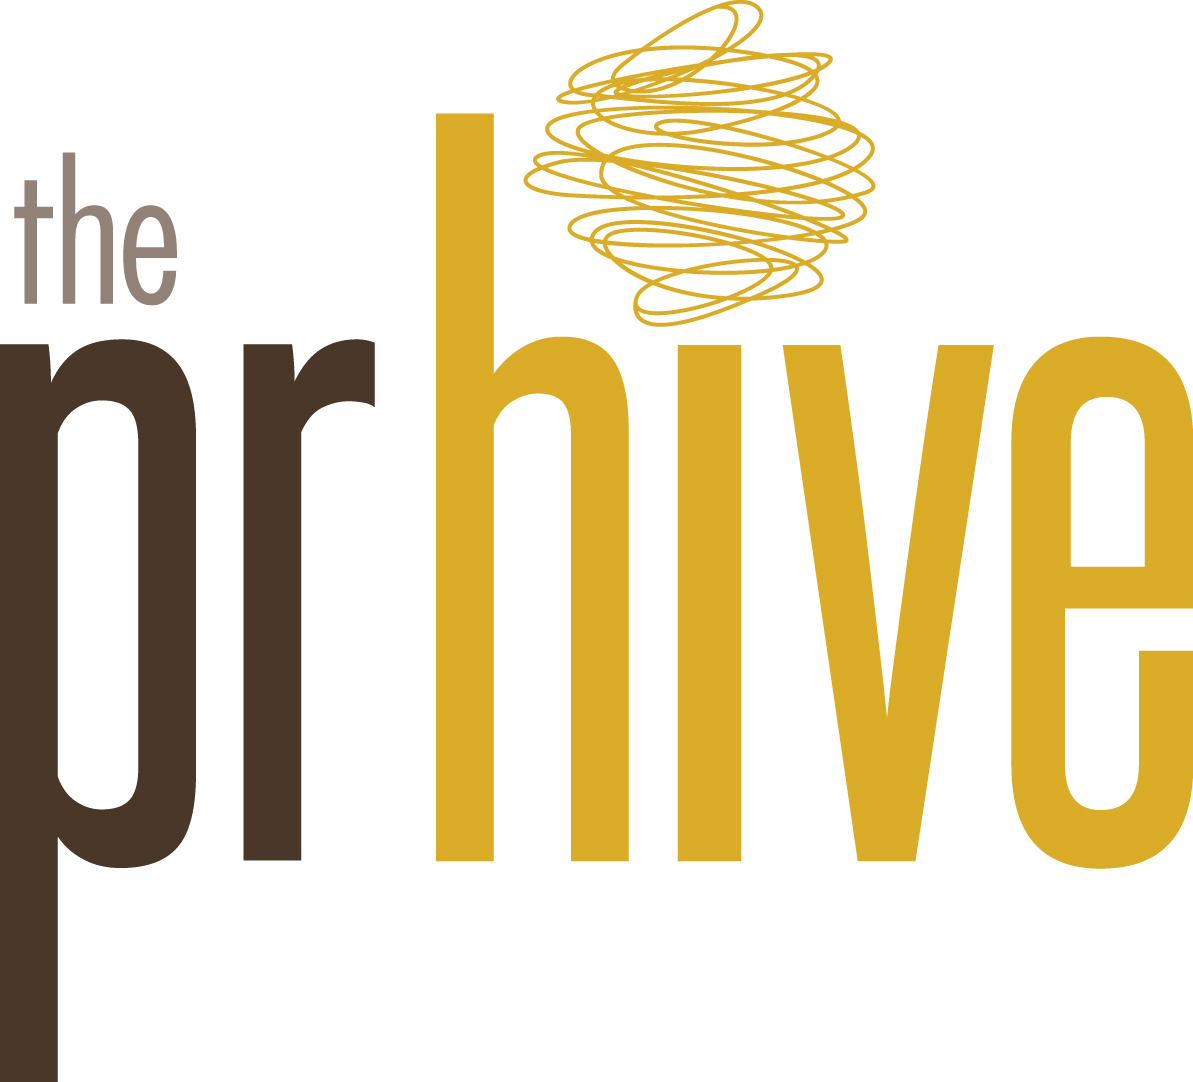 The PR Hive logo